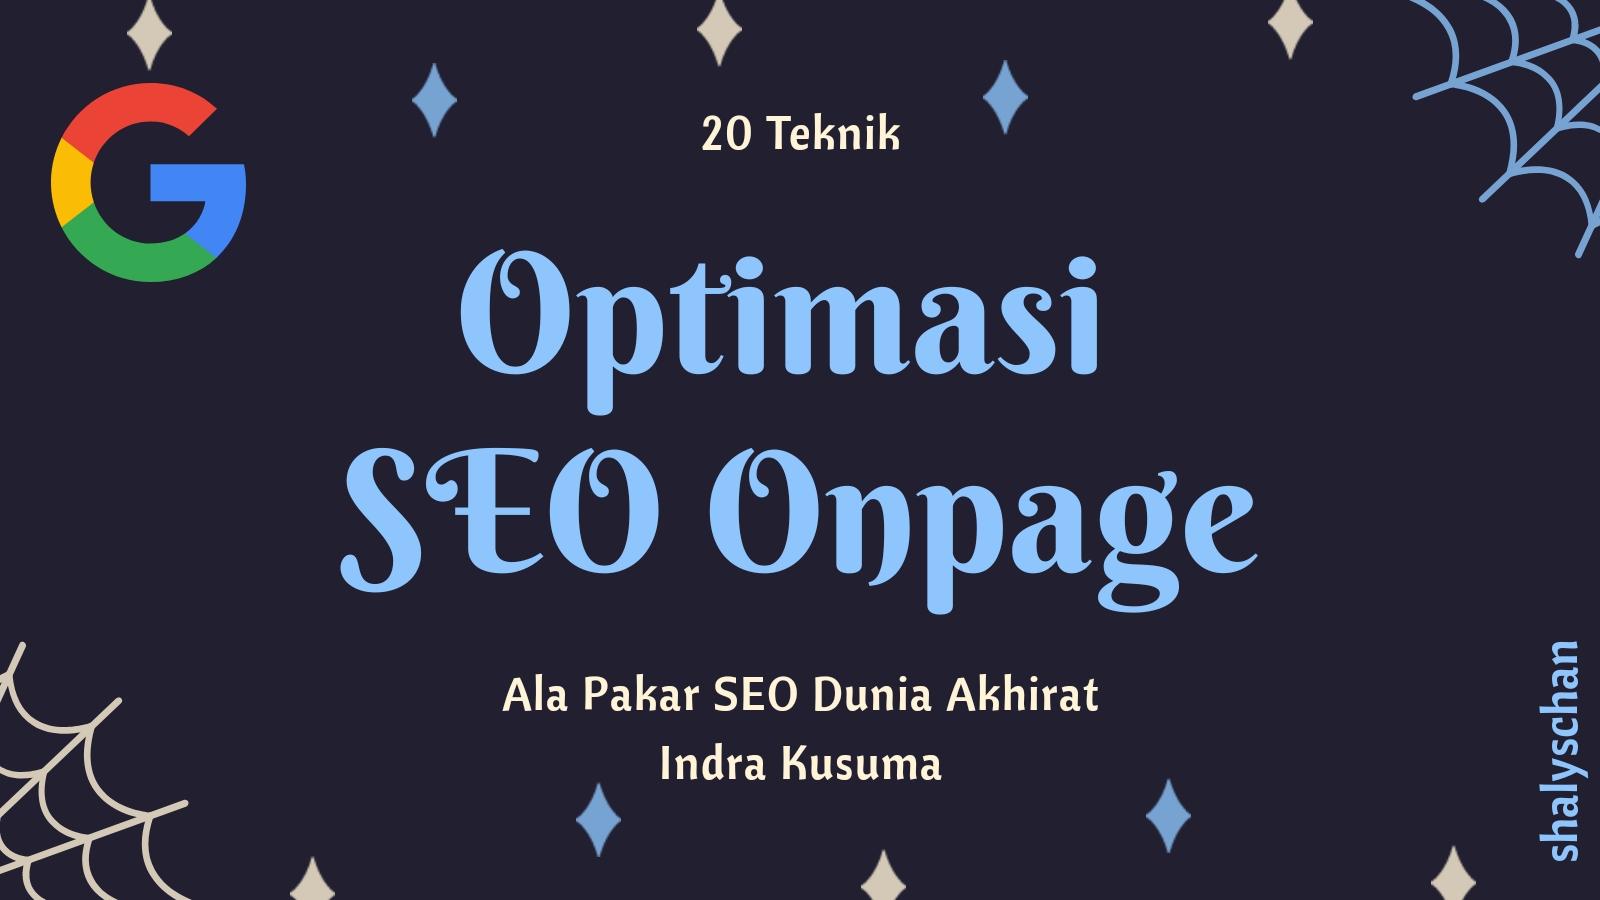 SEO Onpage: 20 Teknik Optimasi SEO On page Ala Indra kusuma